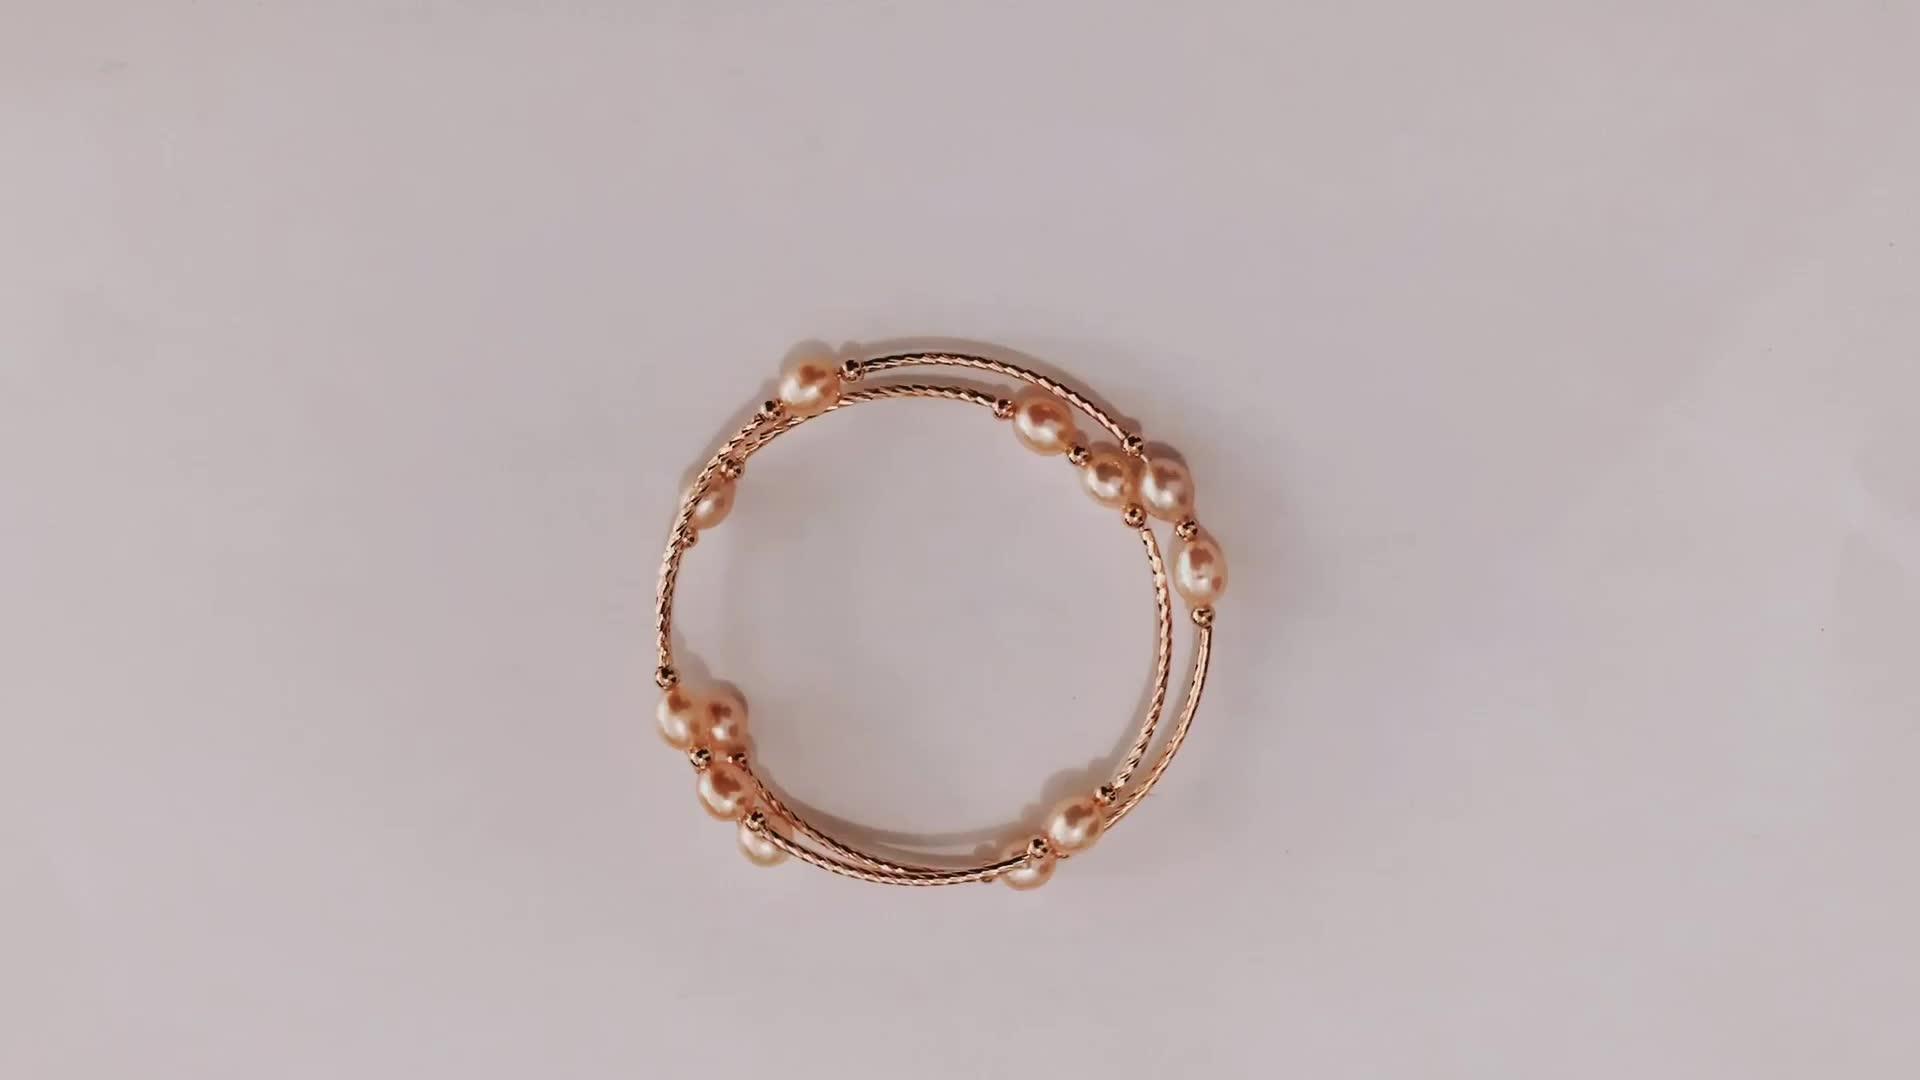 New fashion freshwater pearl bangles bracelet for women